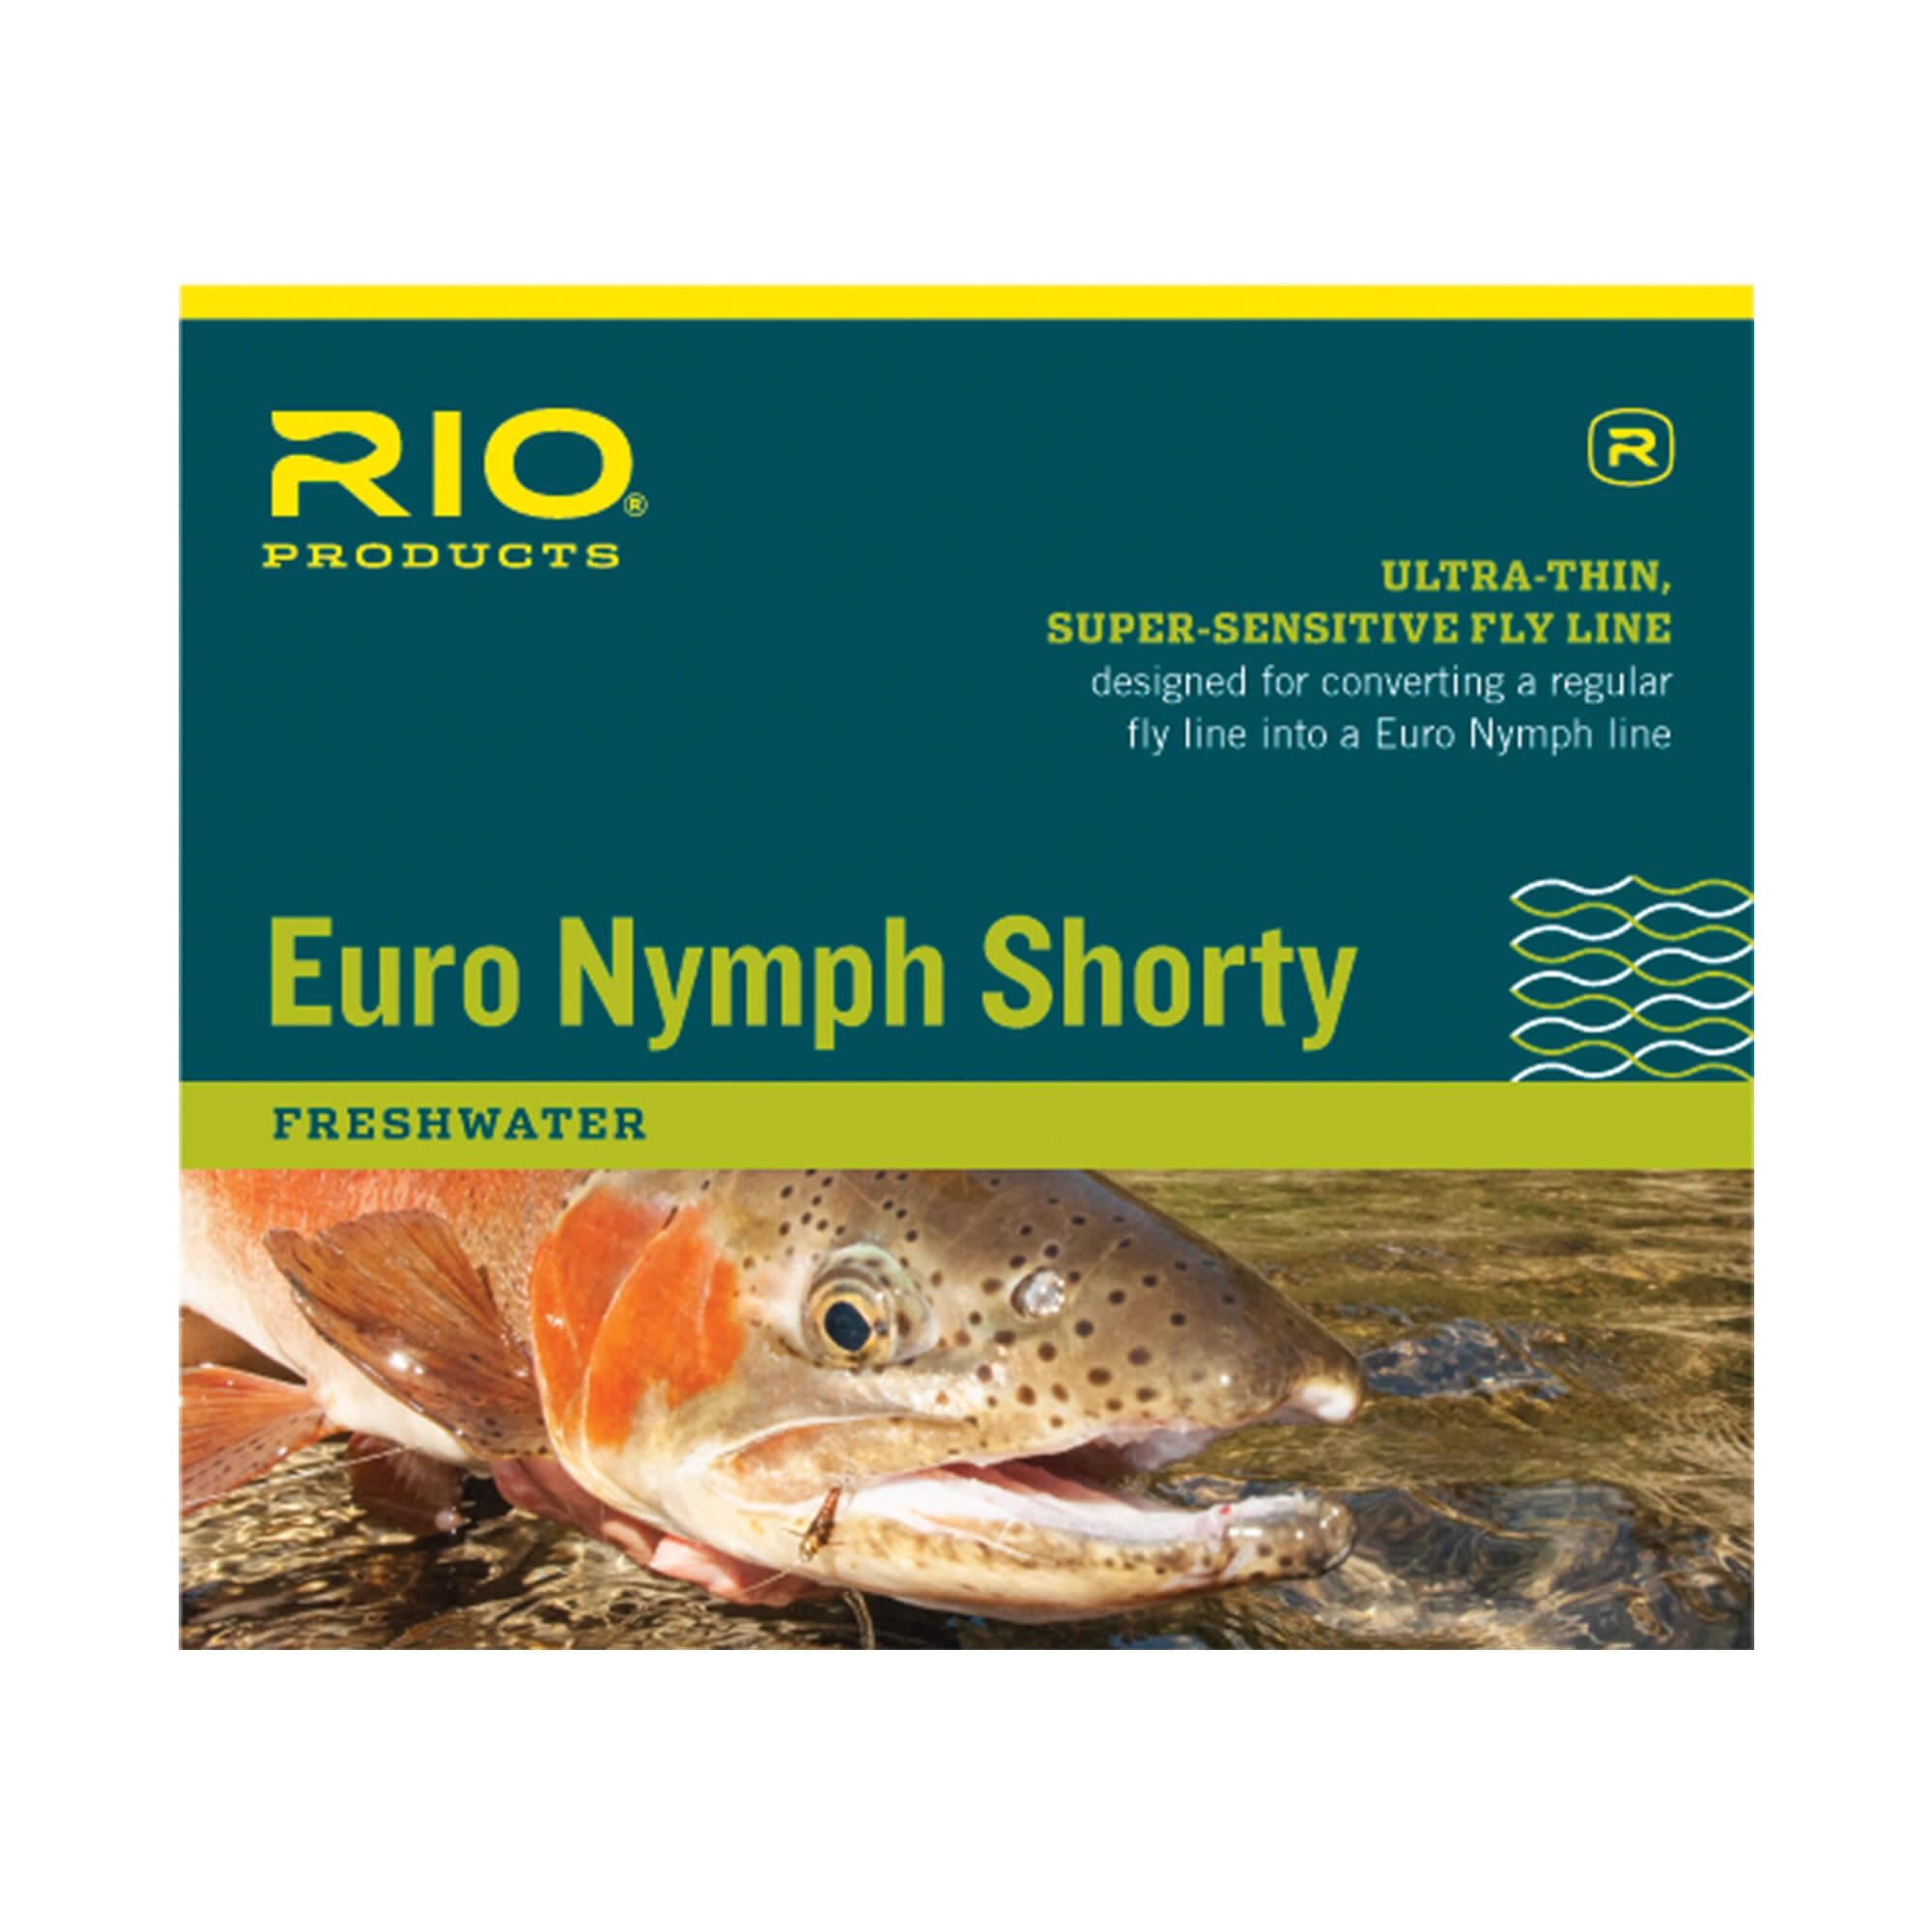 Euro Nymph Shorty